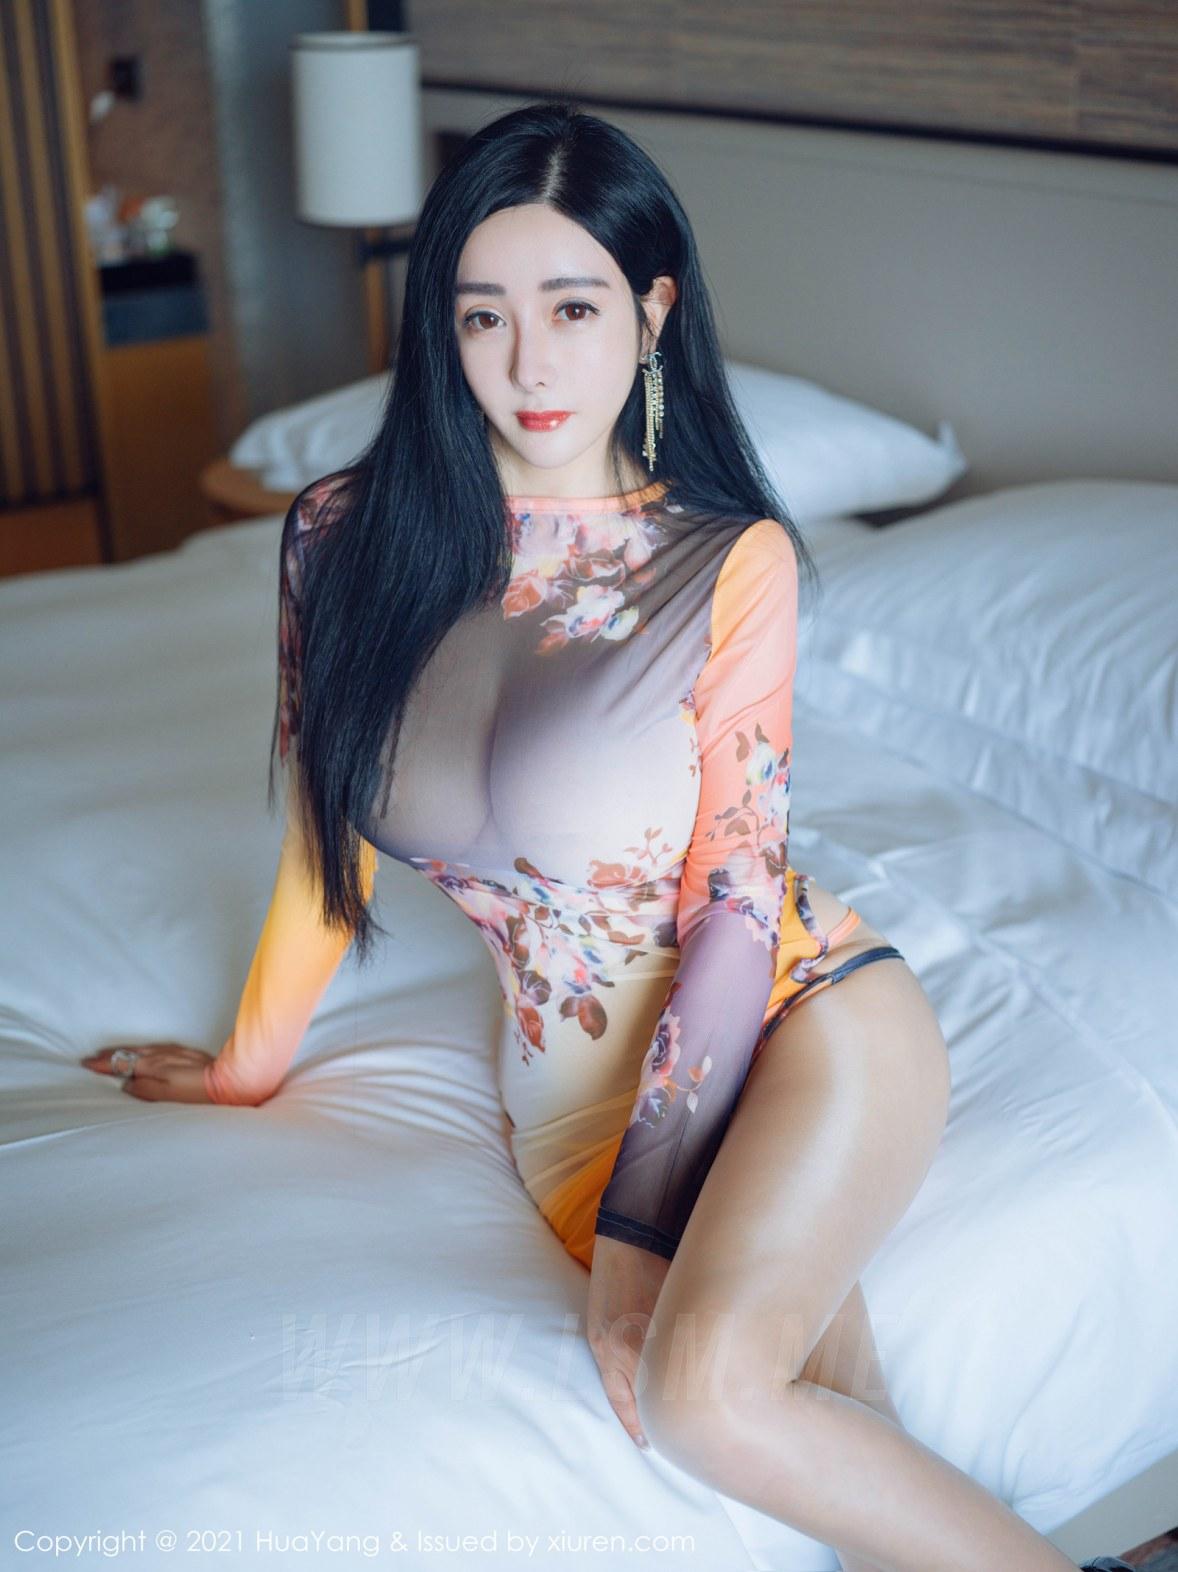 HuaYang 花漾show Vol.427 轻透情趣 允爾 三亚旅拍 - 2